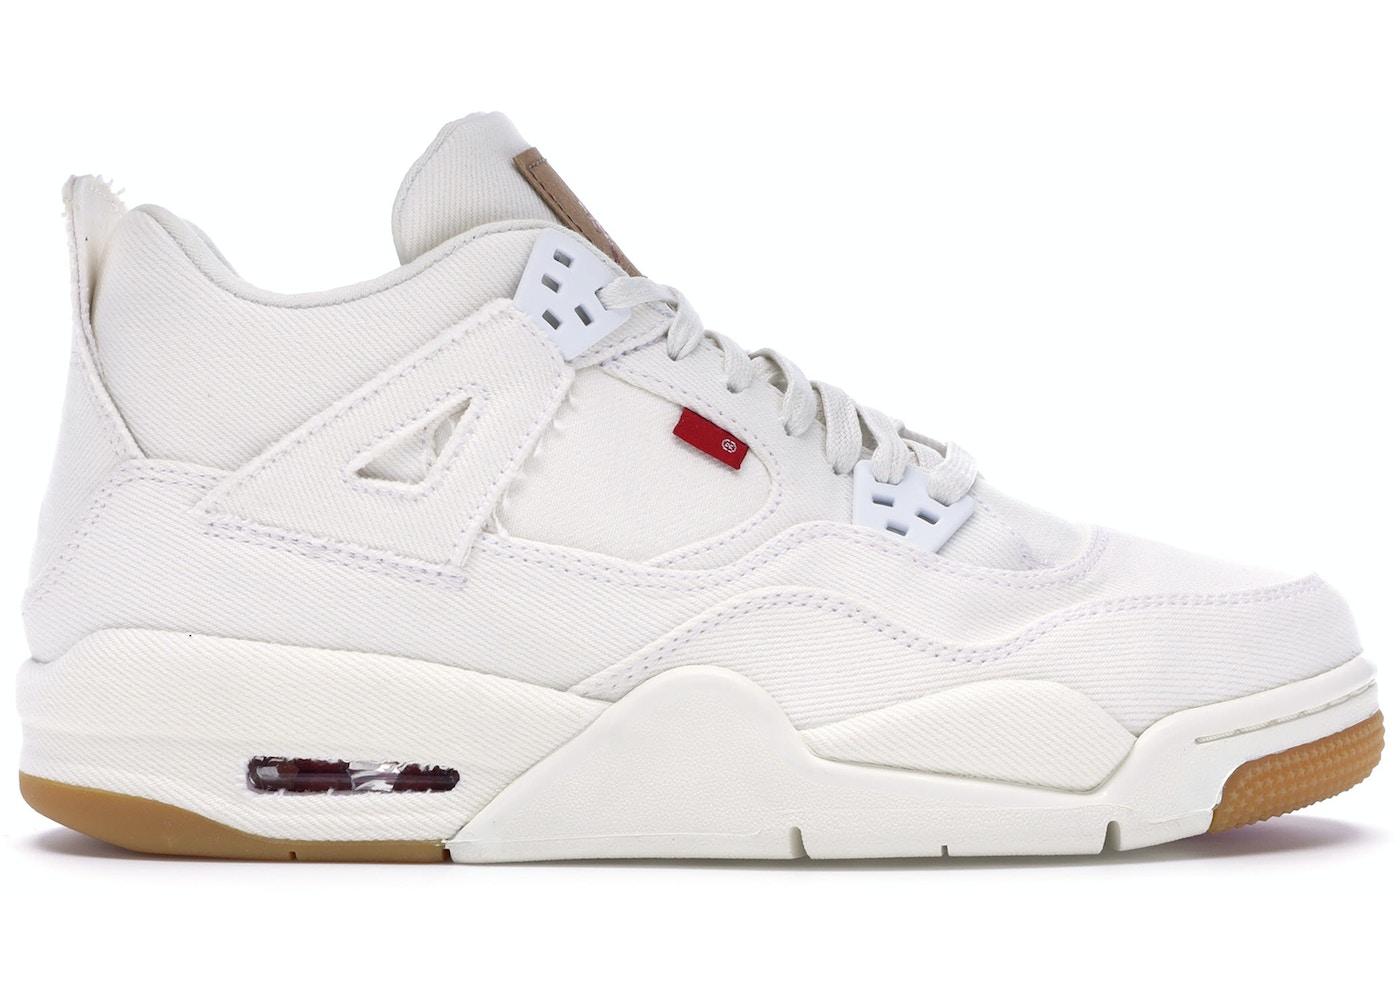 0cbd4dcd8664a3 Air Jordan 4 Shoes - Price Premium